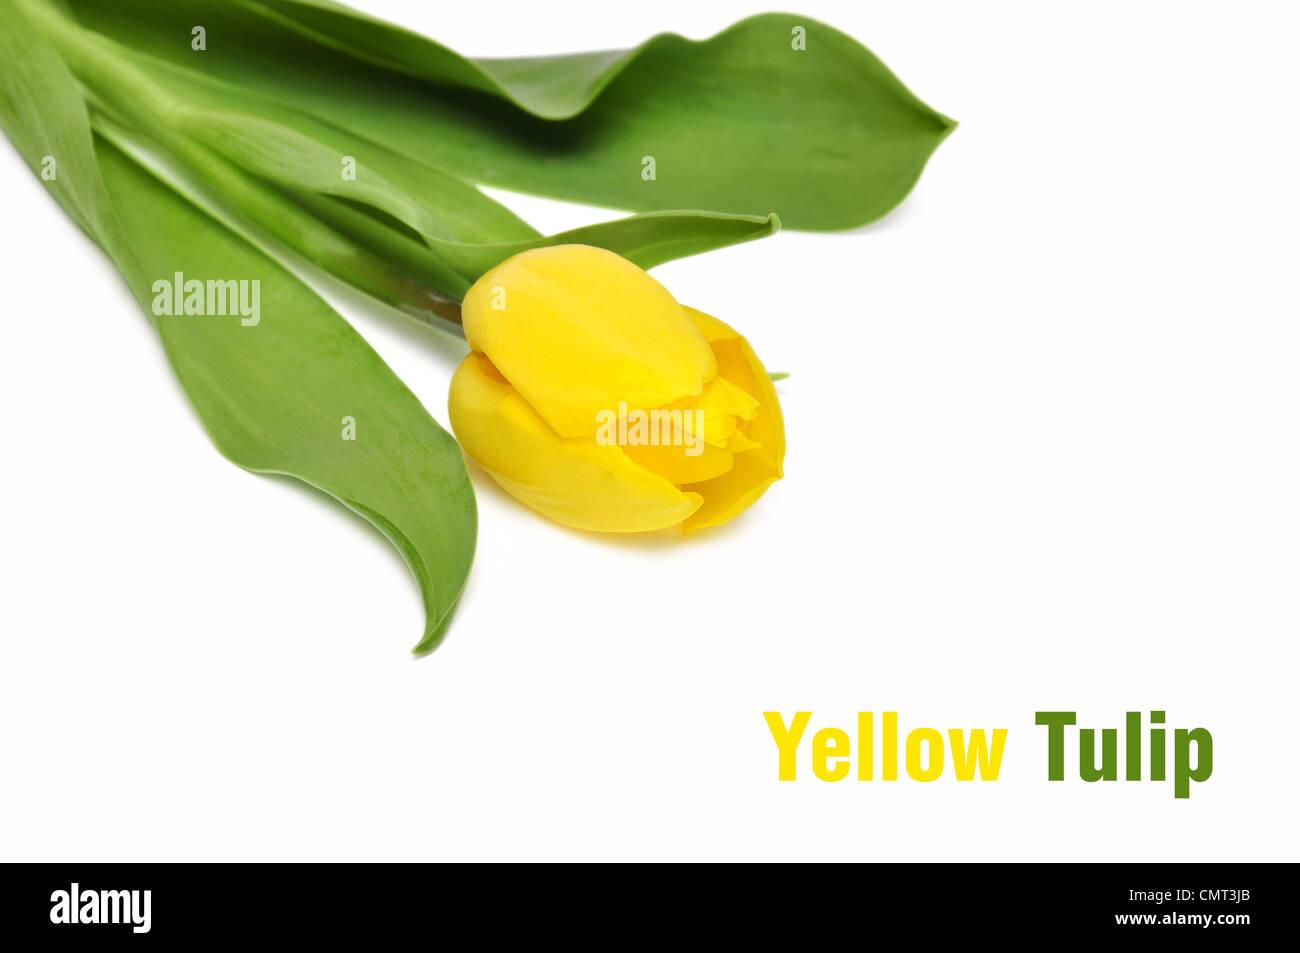 yellow tulip isolated on white background. Closeup, shallow DOF. Stock Photo